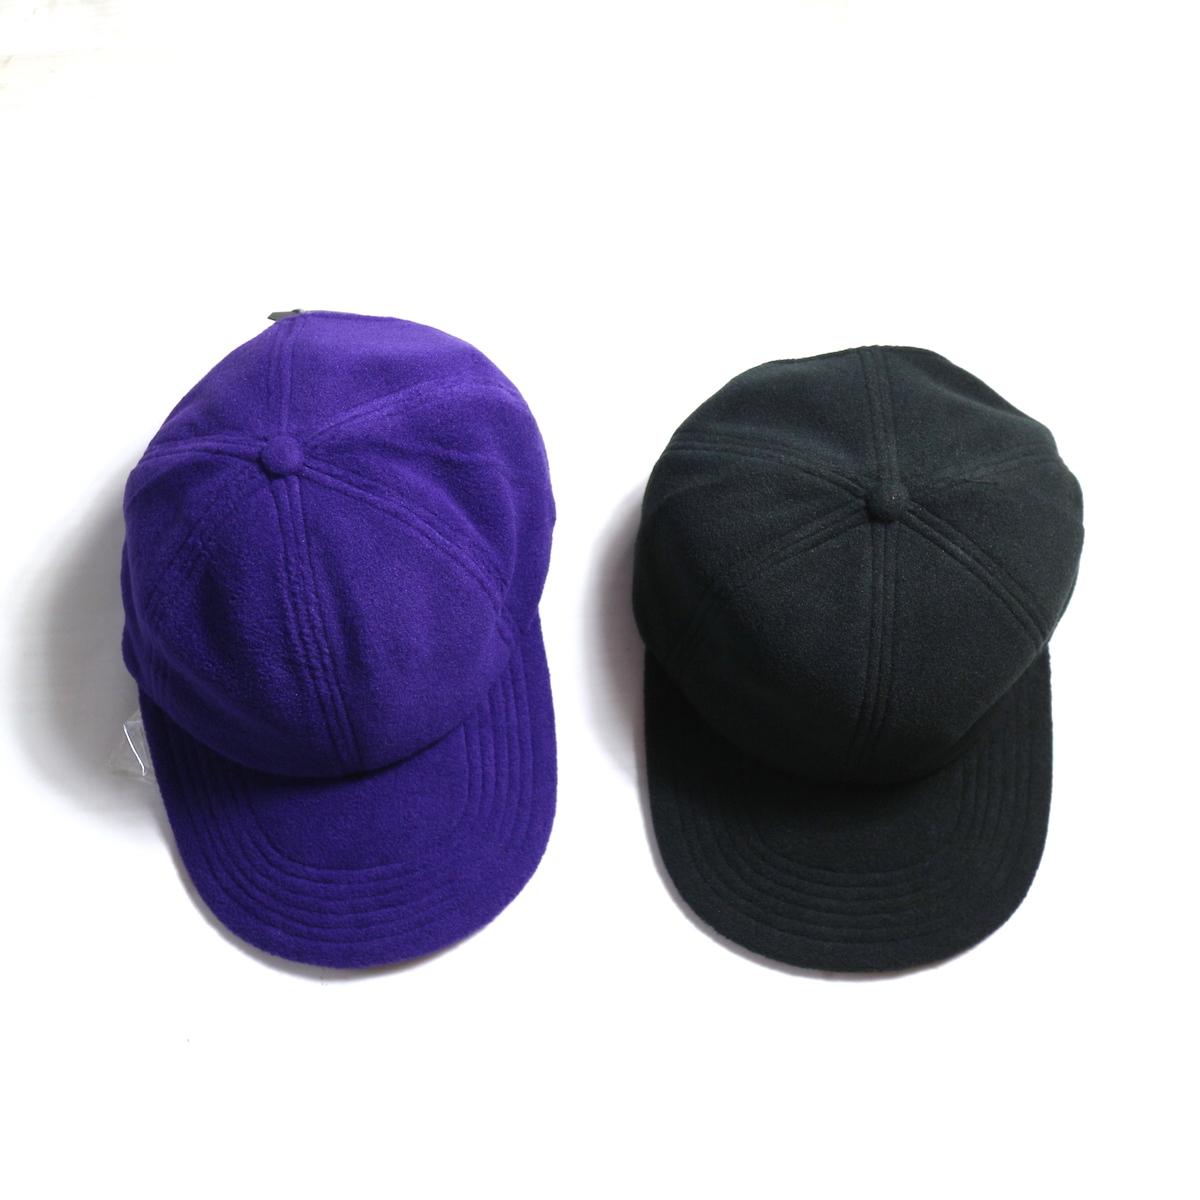 UNUSED / UH0474 Polartec Fleece Cap